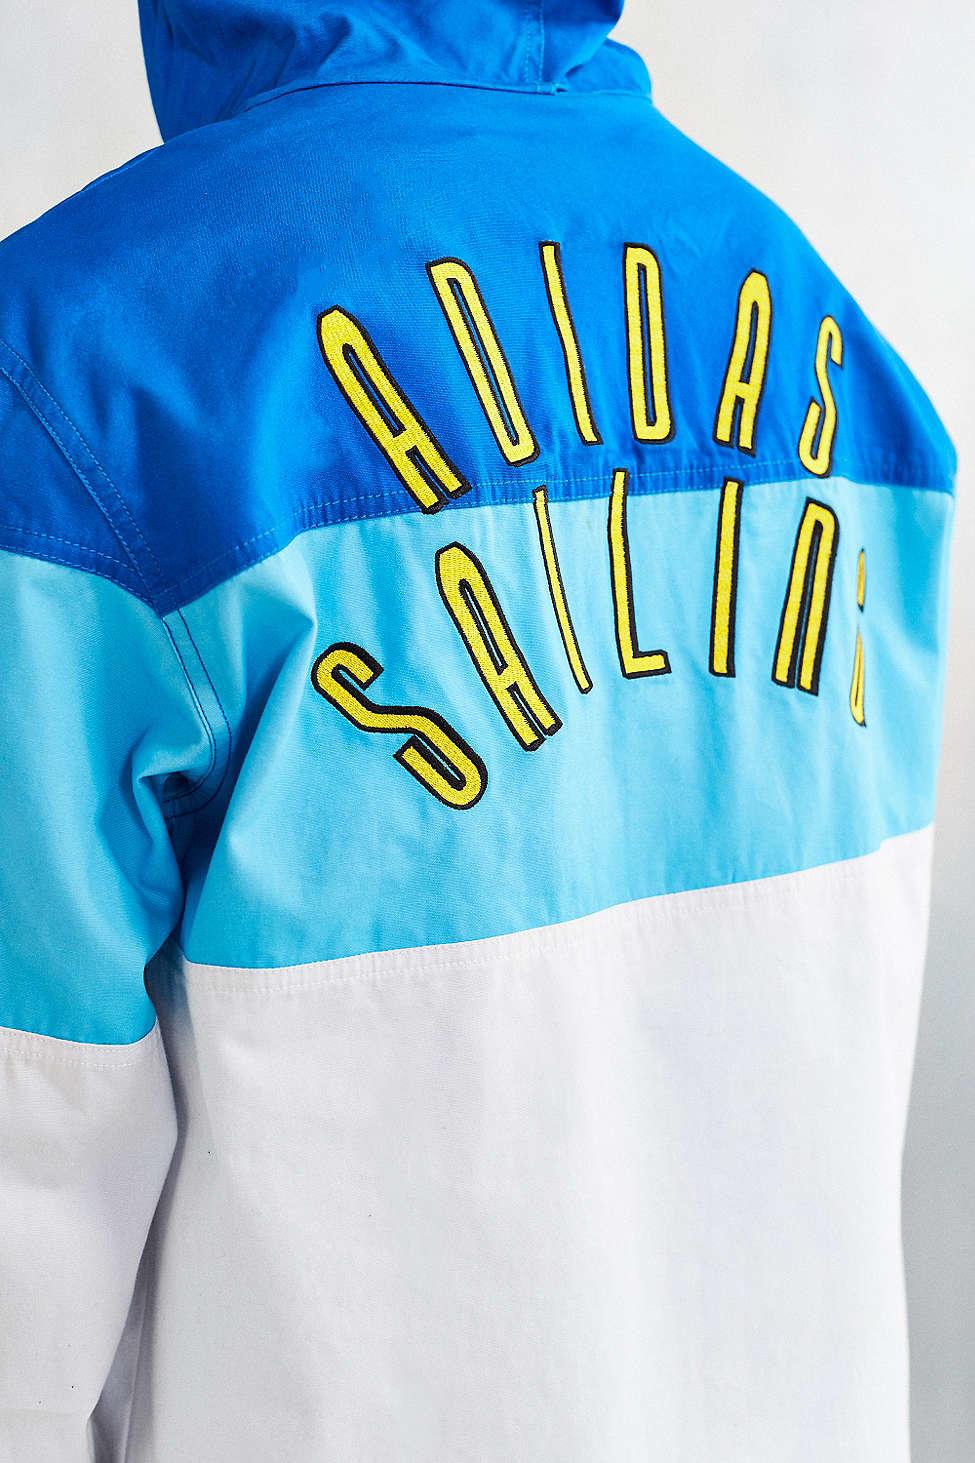 Zip Half For Adidas Sailing Jacket Men Graphic Originals White nXN08wOPk